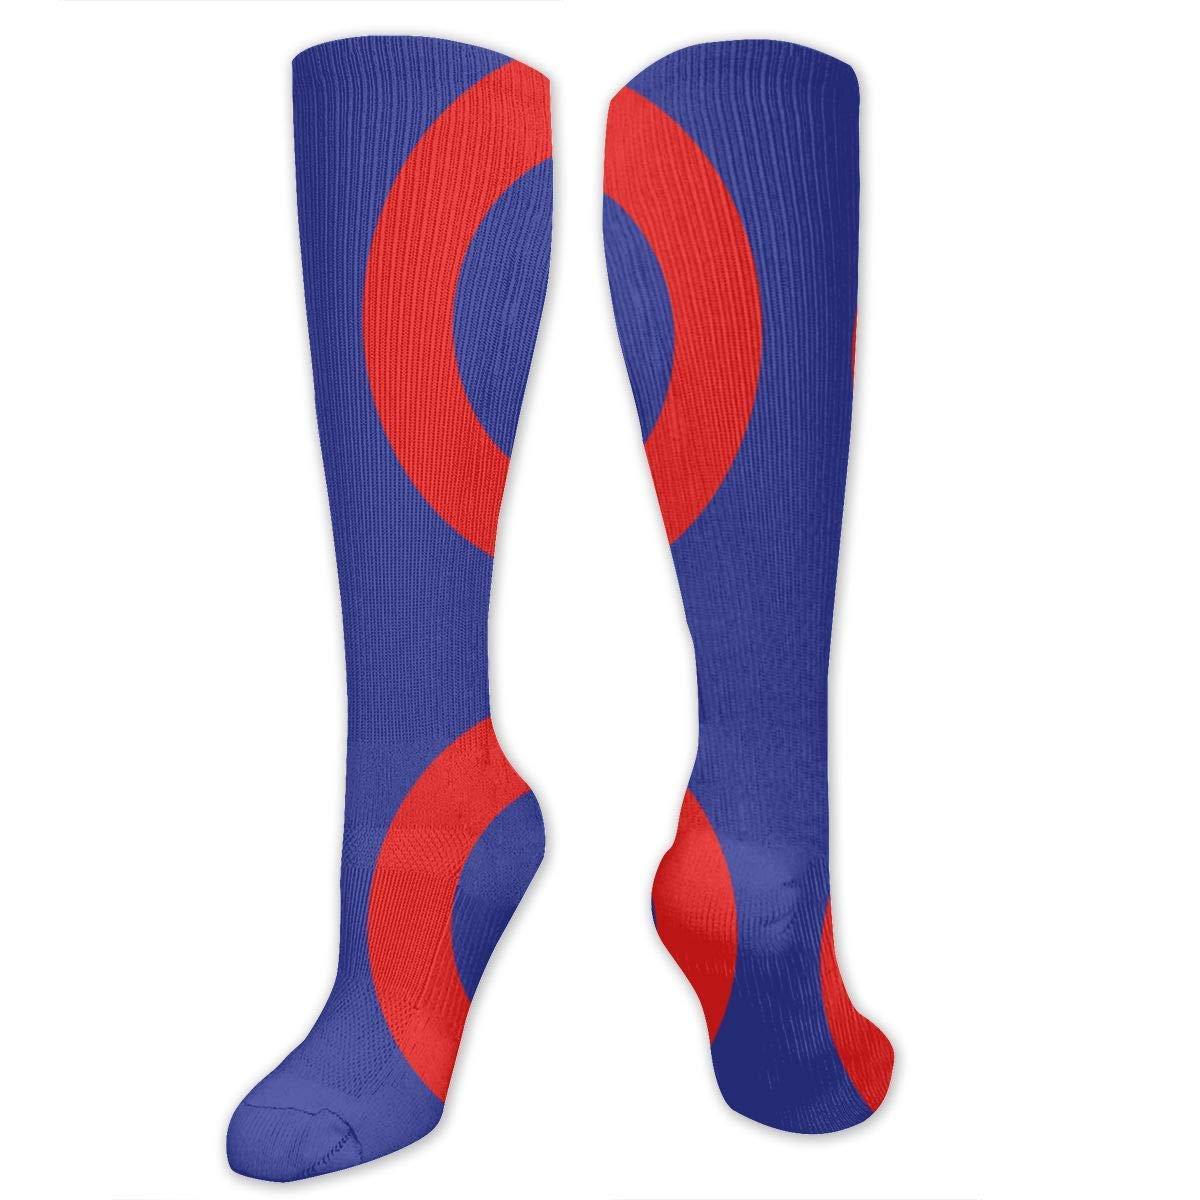 Fabric 1787 Mens//Womens Sensitive Feet Wide Fit Crew Socks and Cotton Crew Athletic Sock Phish Proper Size! XXL